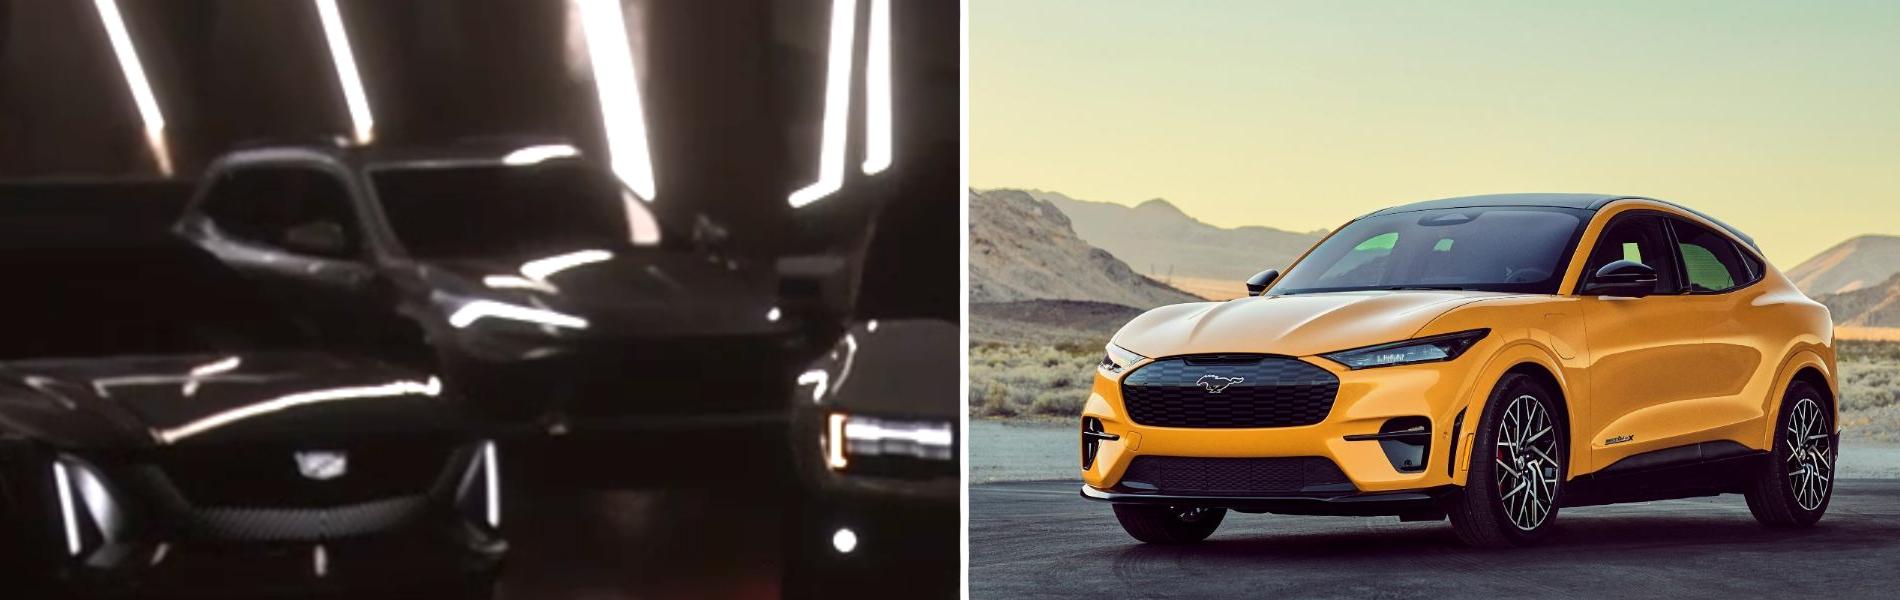 SUV elétrico do Corvette x Ford Mustang Mach E